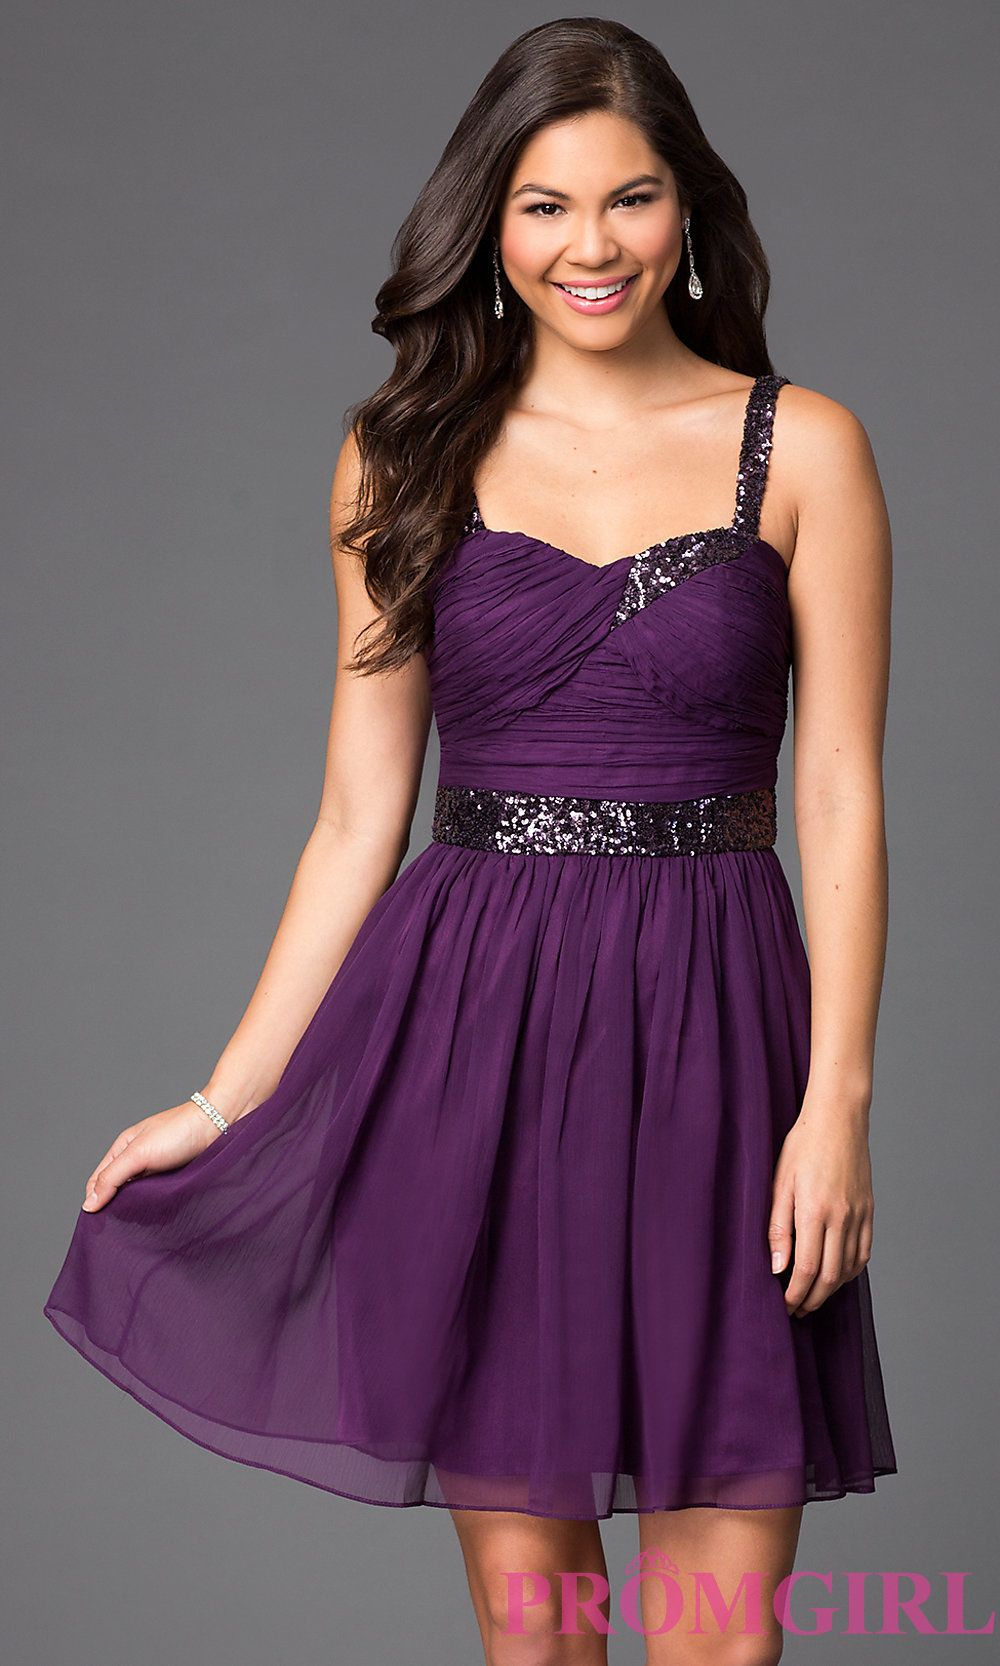 Short Sleeveless Purple Party Dress   Homecoming 2016 Under $100 ...